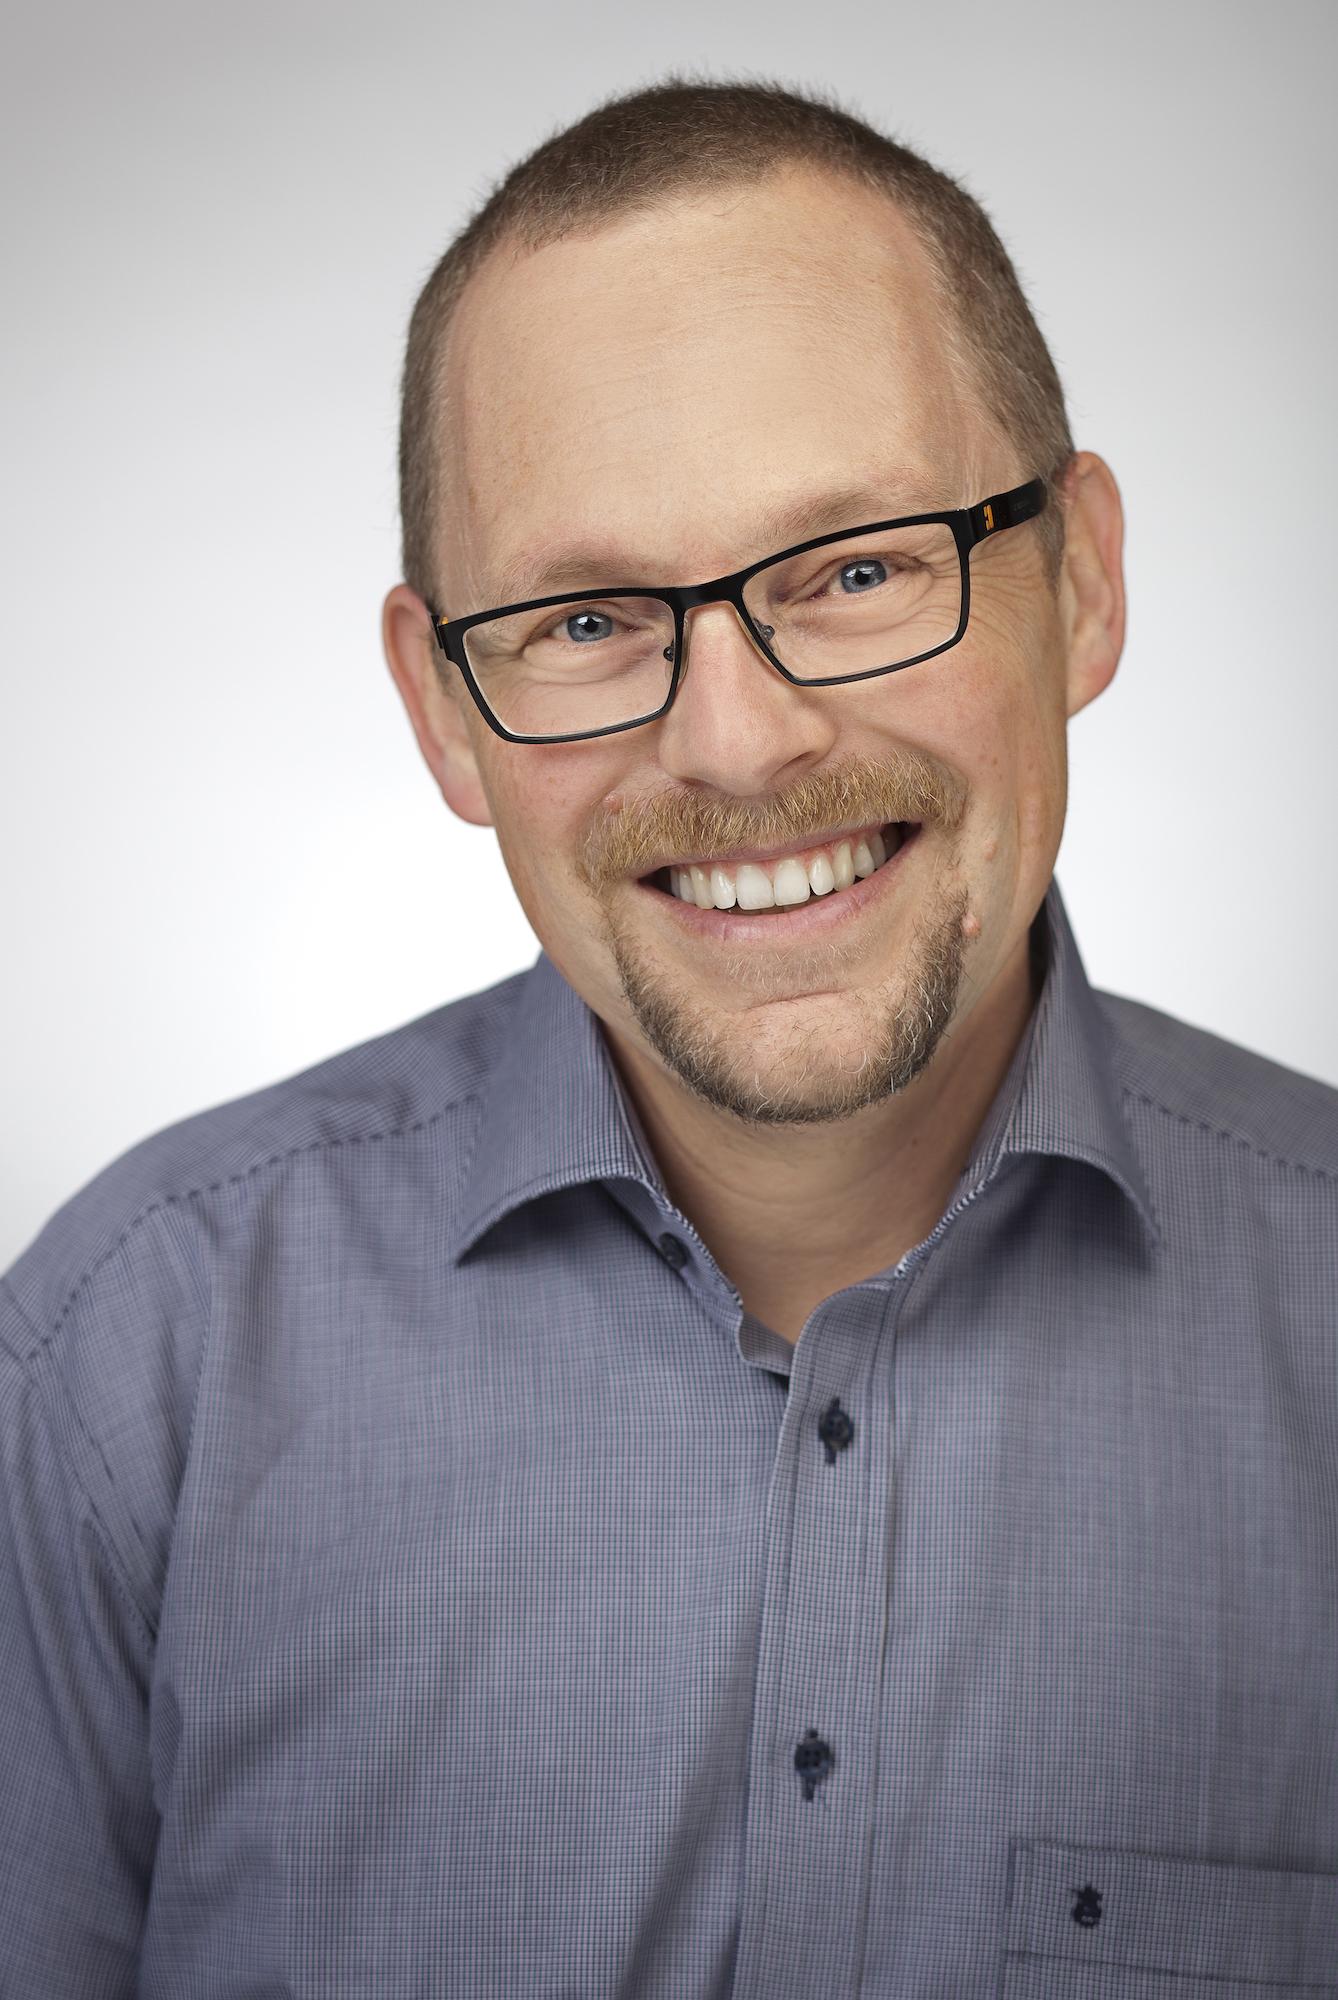 Matthias Mehl